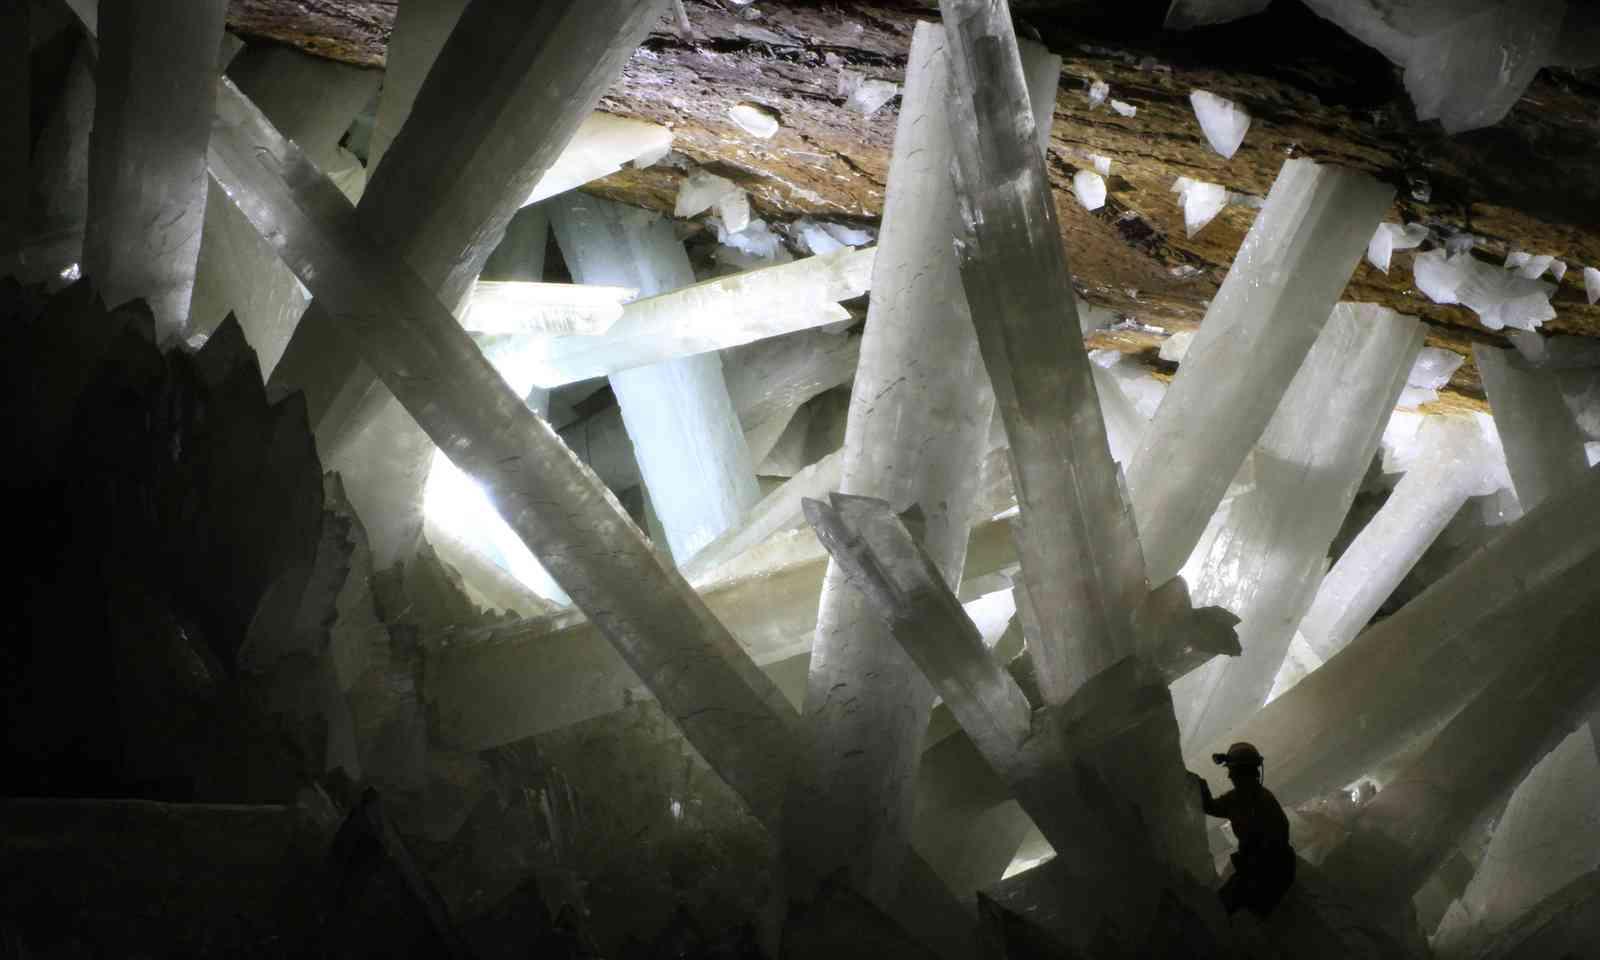 Gypsum crystals in the Naica cave (Creative Commons: Alexander Van Driessche)